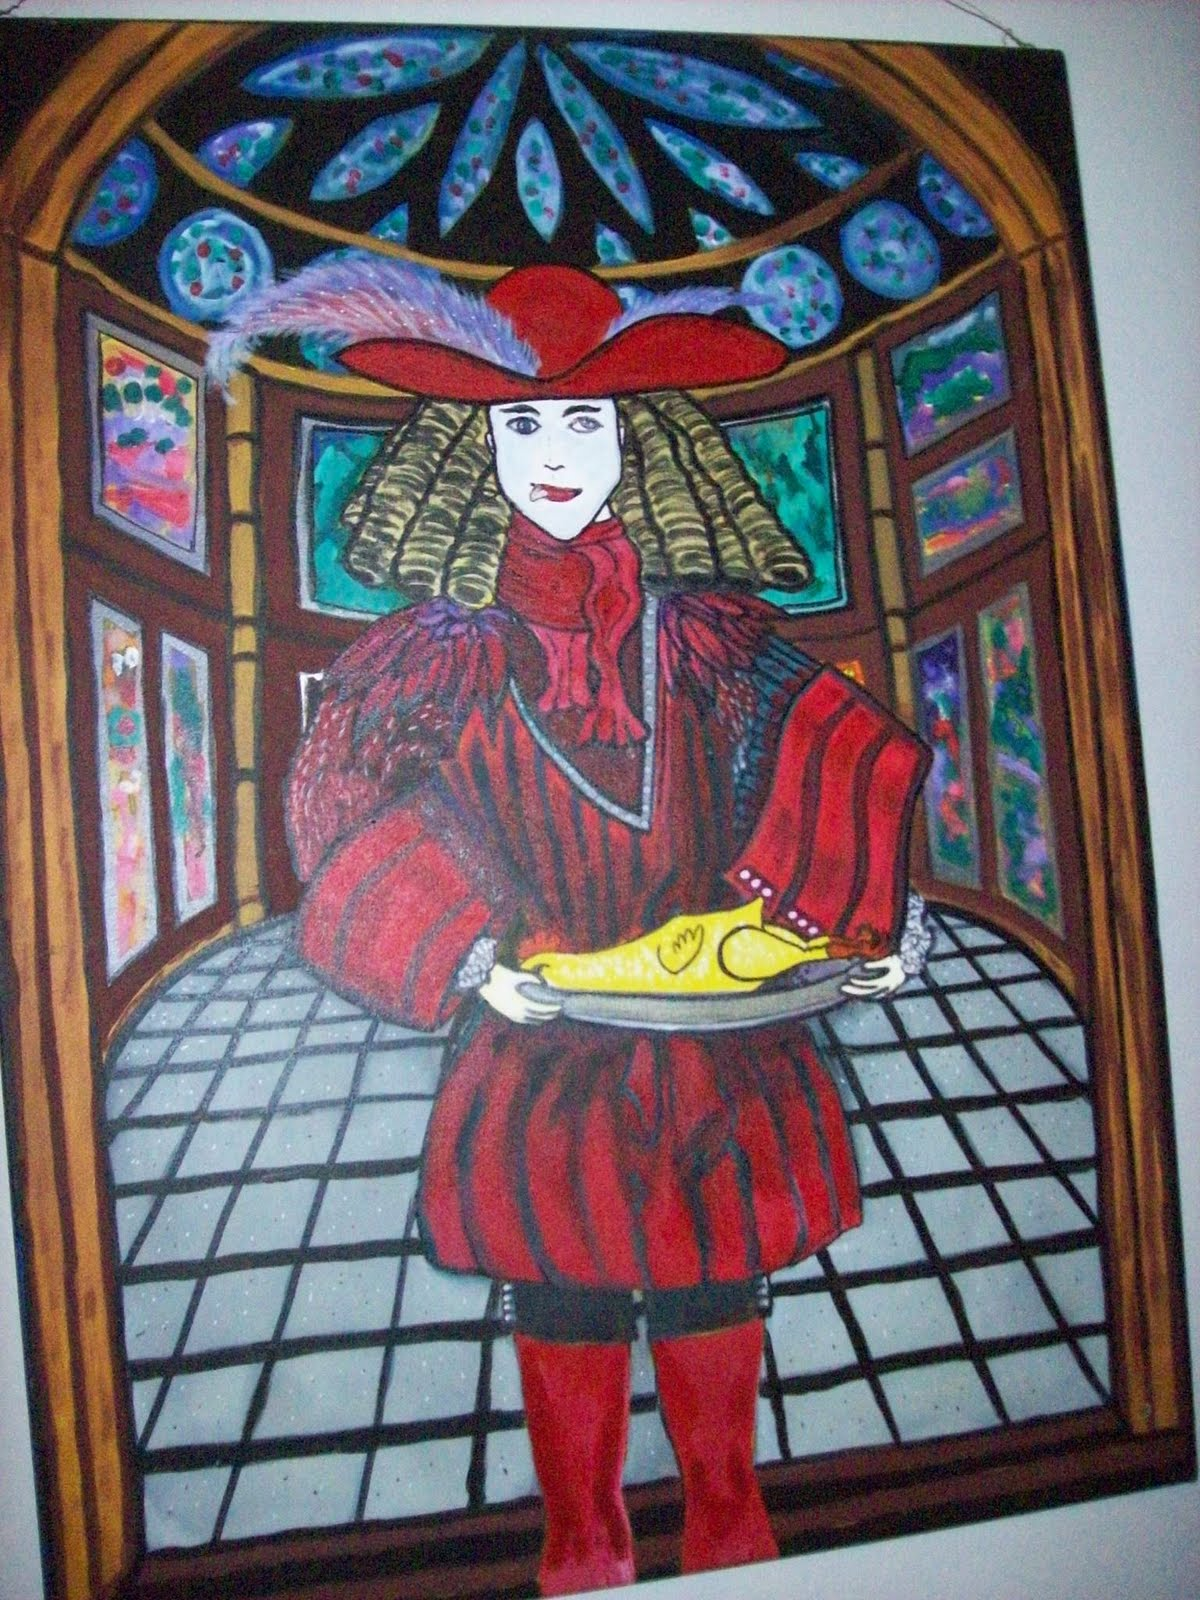 The Celebrated Rubber Chickens Of Dingo Dizmal: Tarot Card